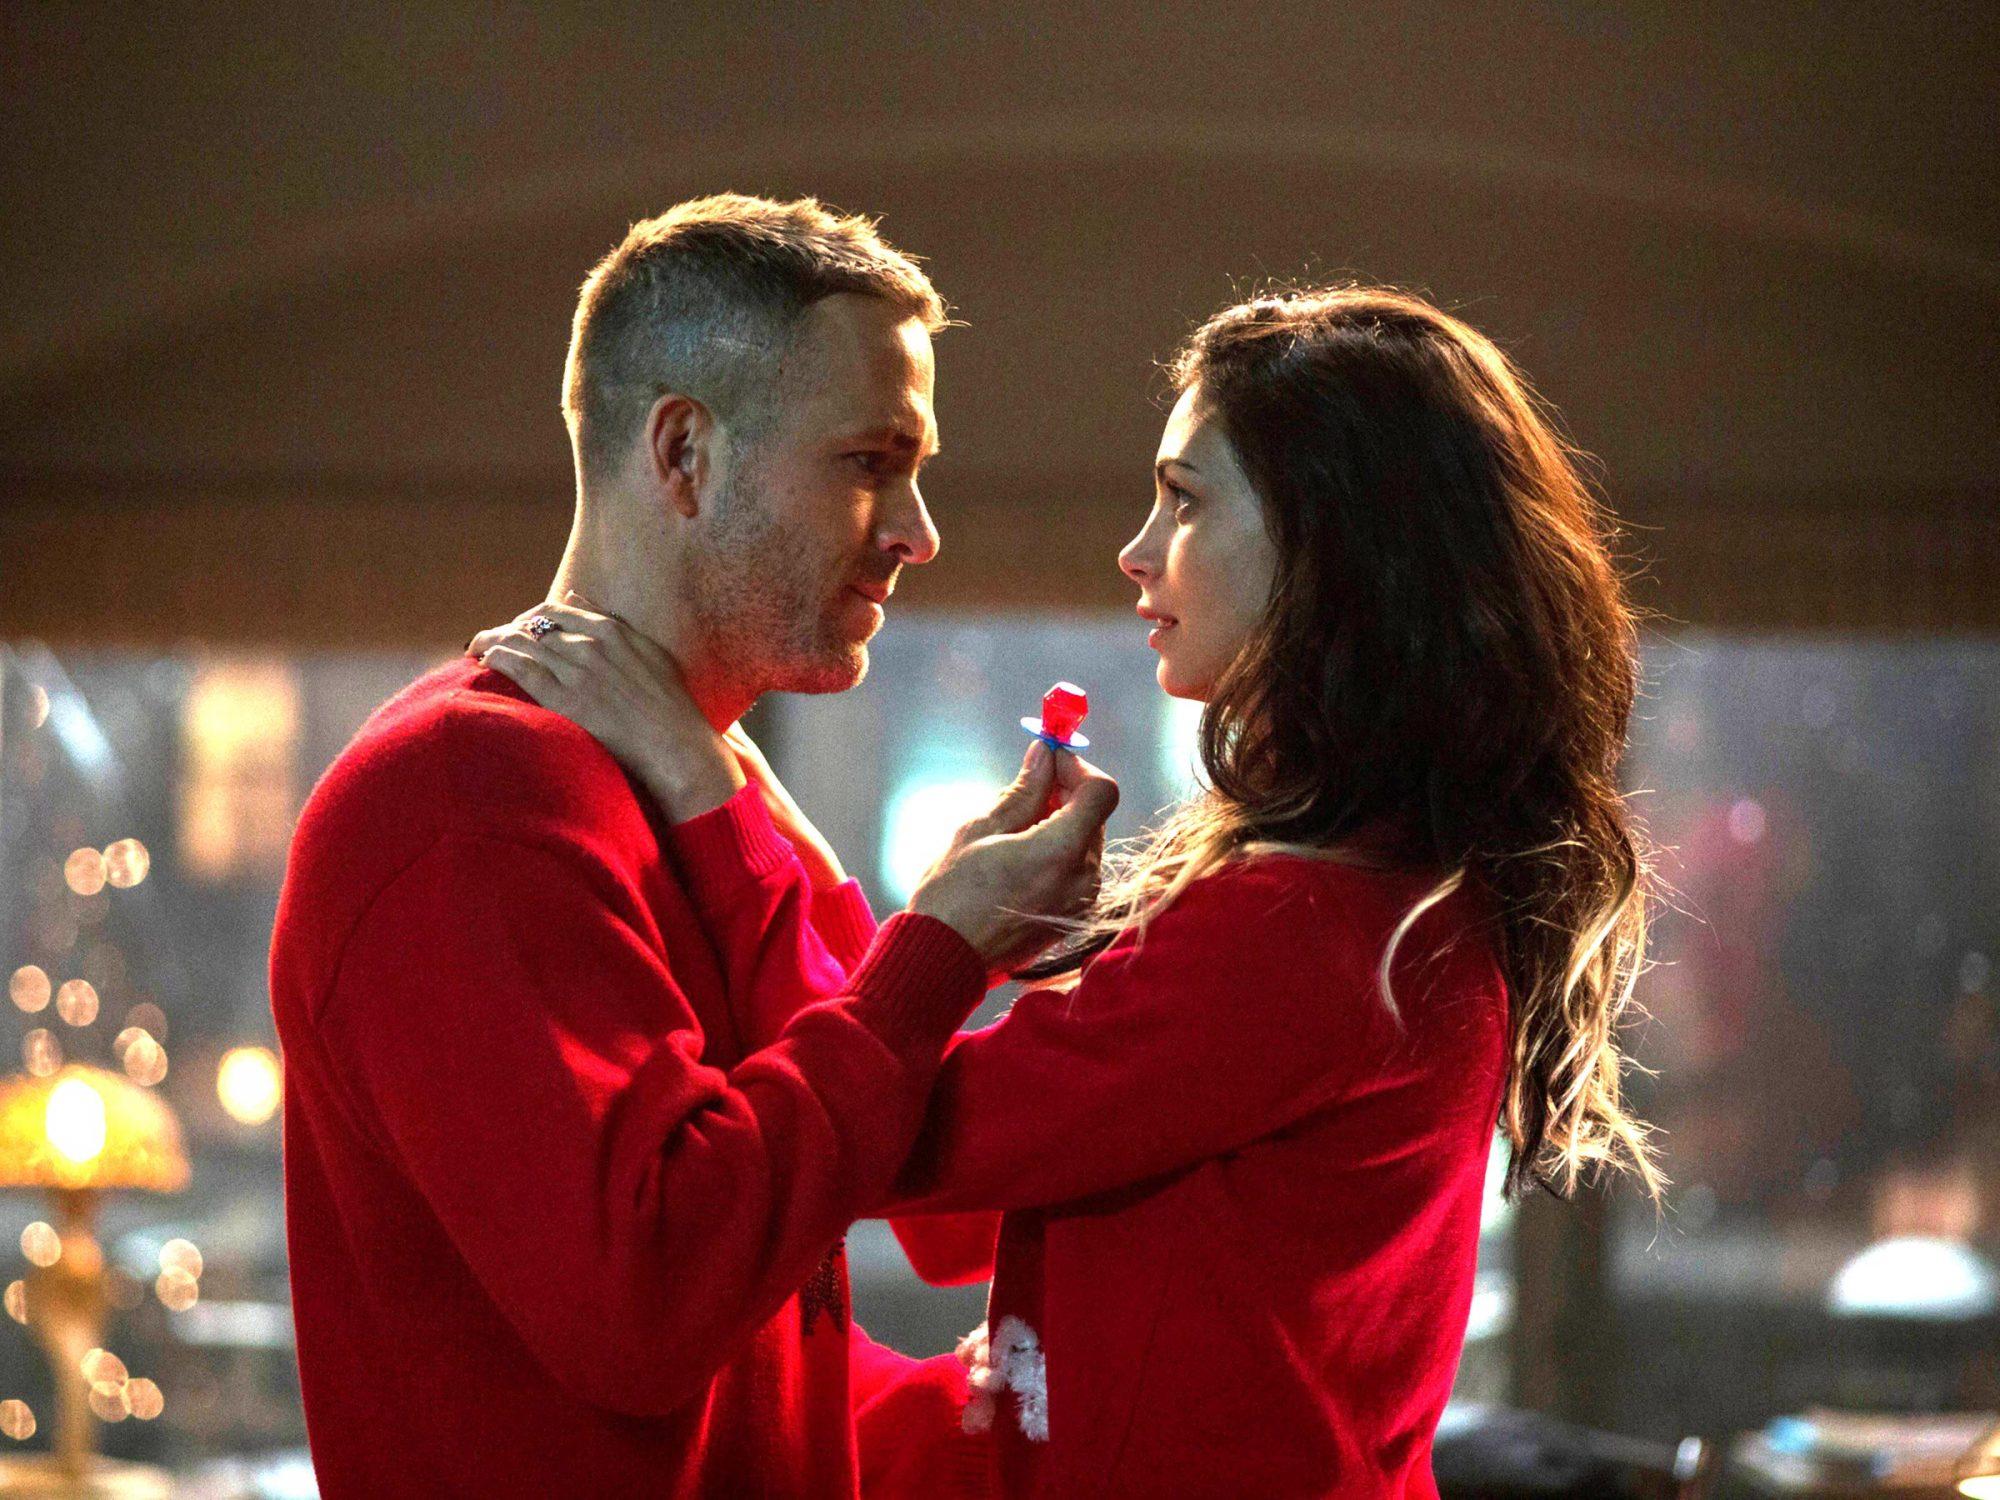 DEADPOOL, from left: Ryan Reynolds, Morena Baccarin, 2016. TM & copyright © 20th Century Fox Film